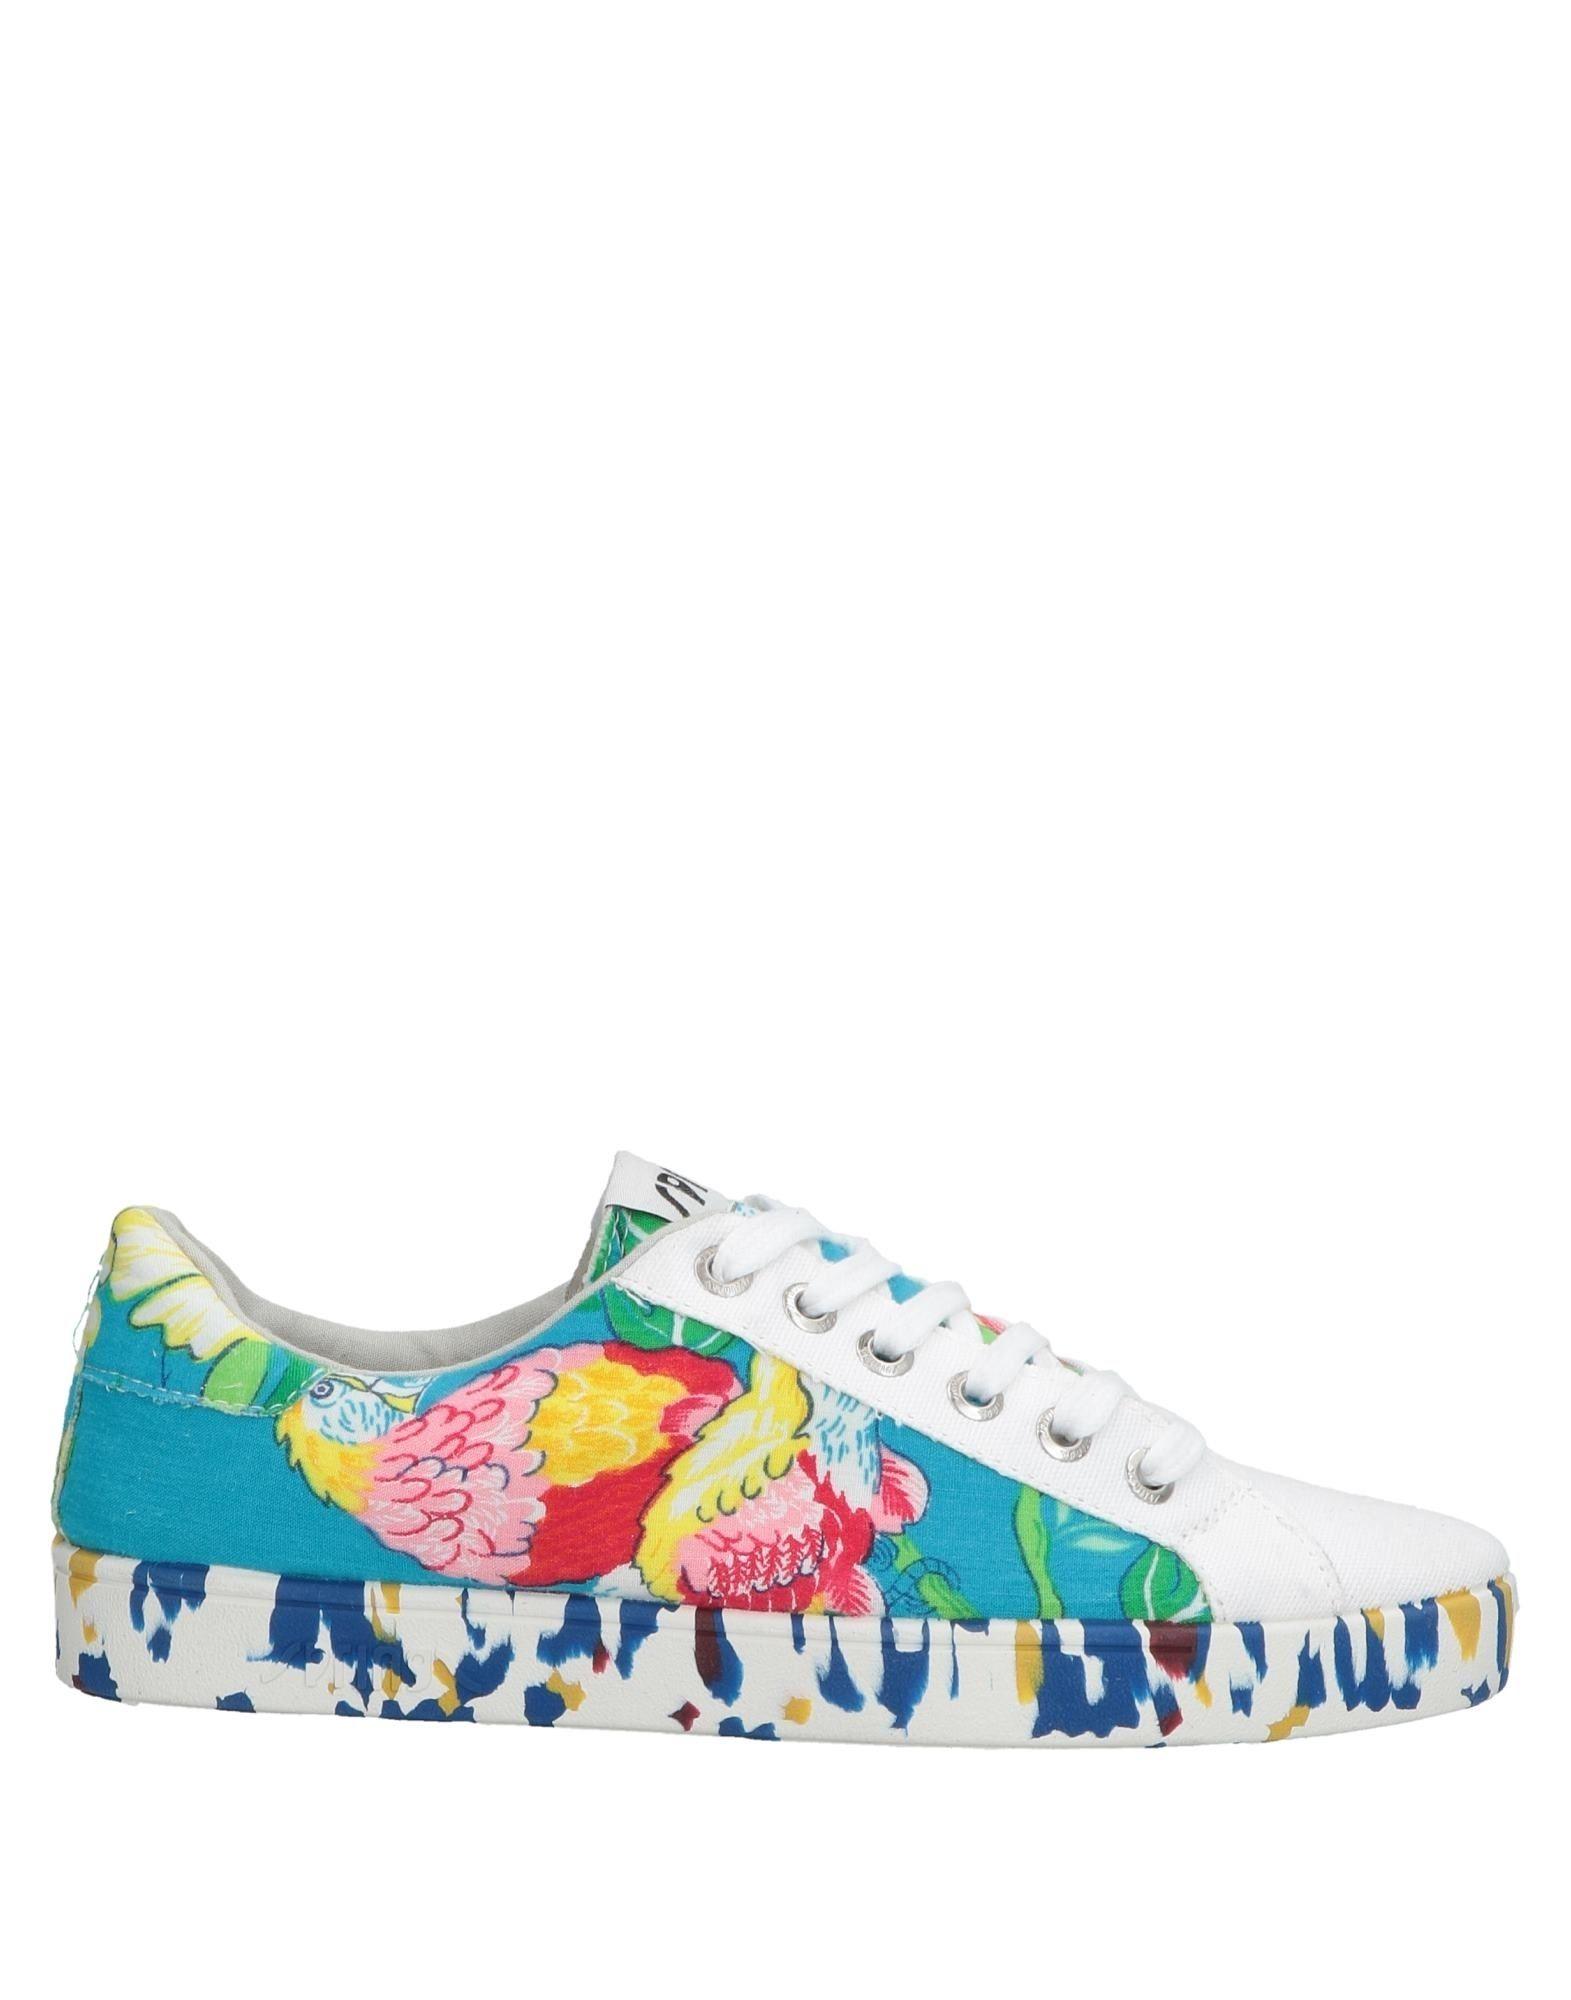 Springa Sneakers - Women Springa Sneakers online on 11574512PV  United Kingdom - 11574512PV on d29cf7